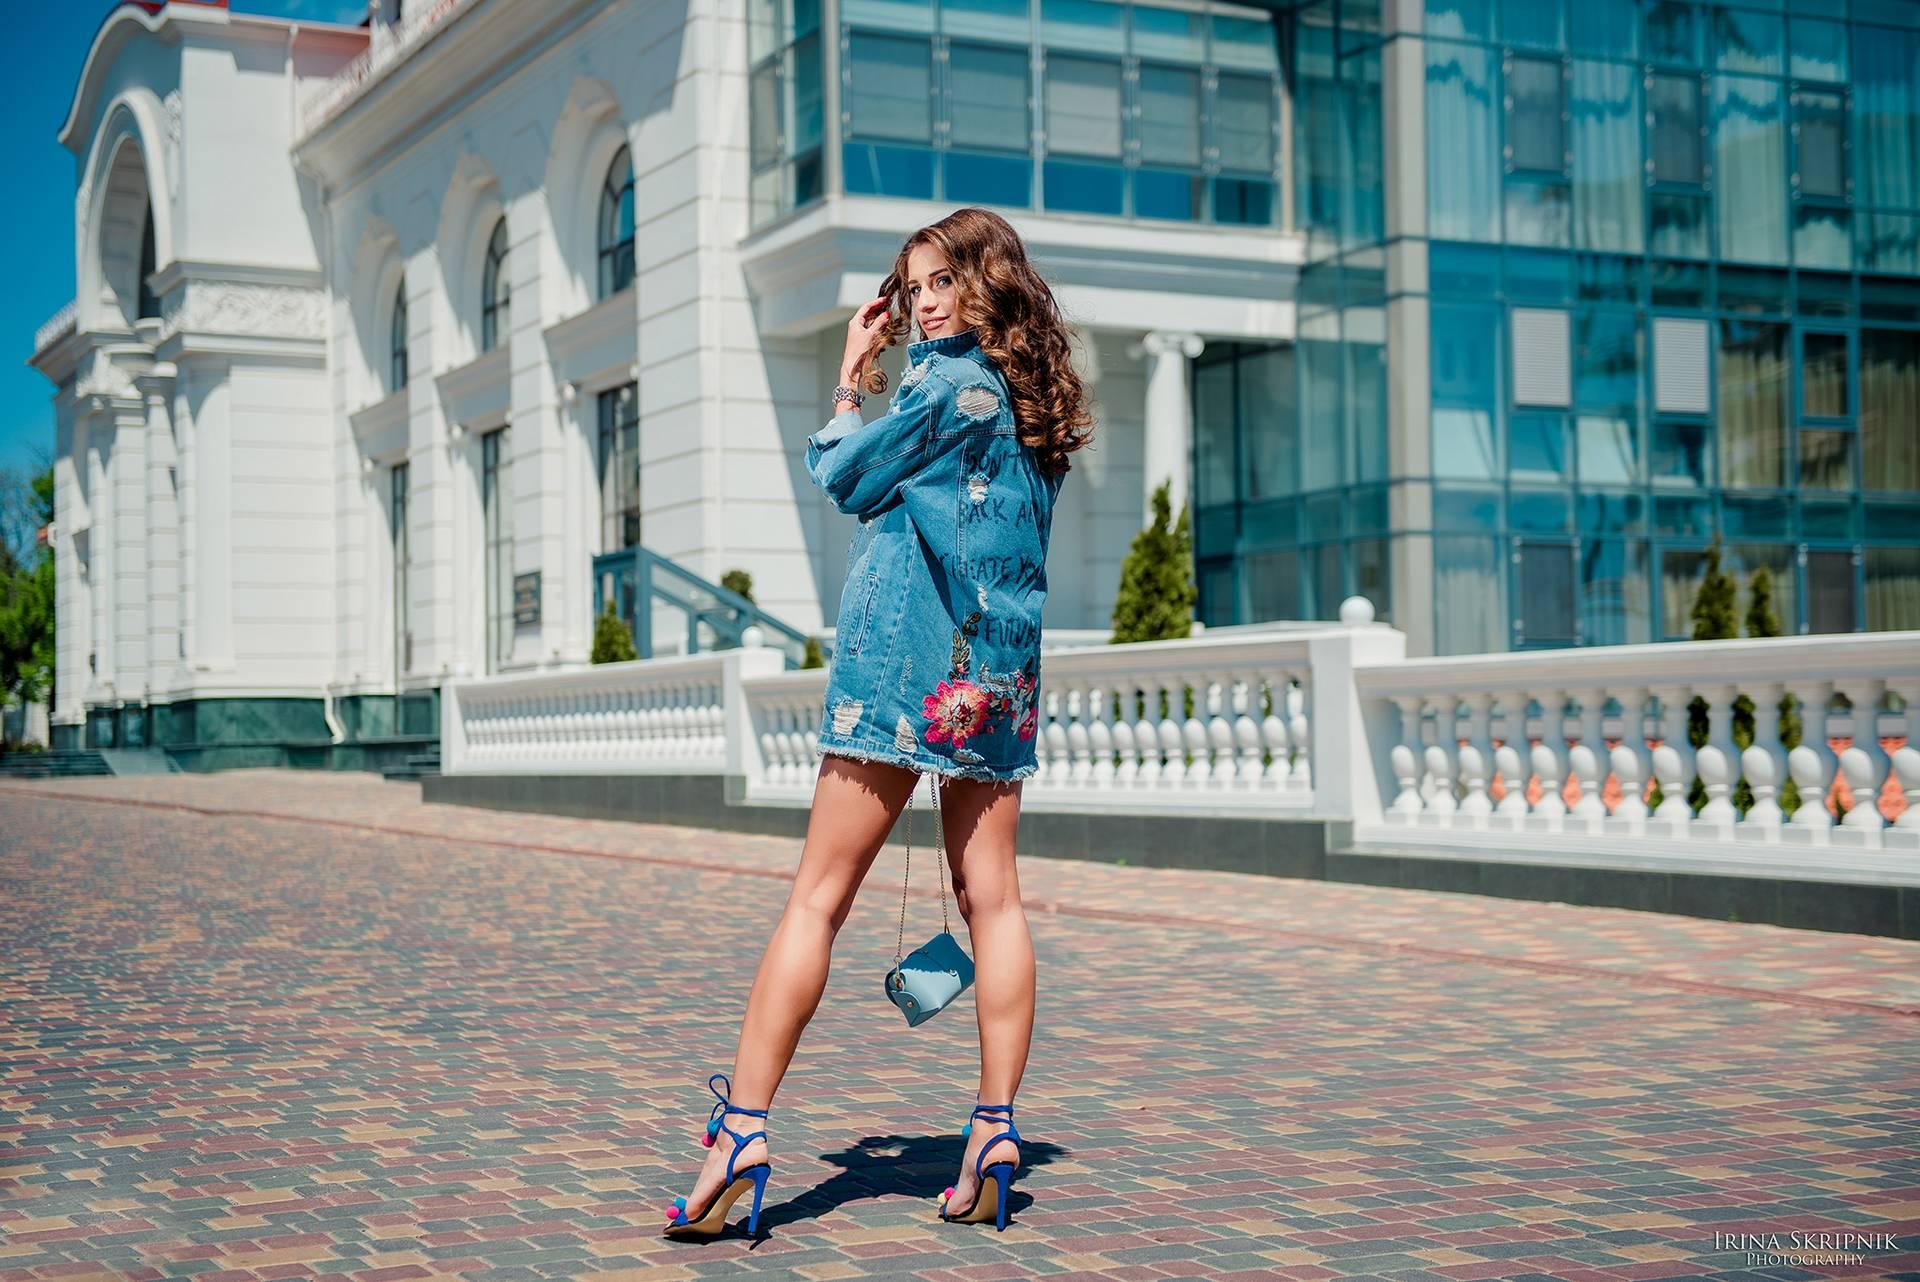 Irina Skripnik Photography 31051